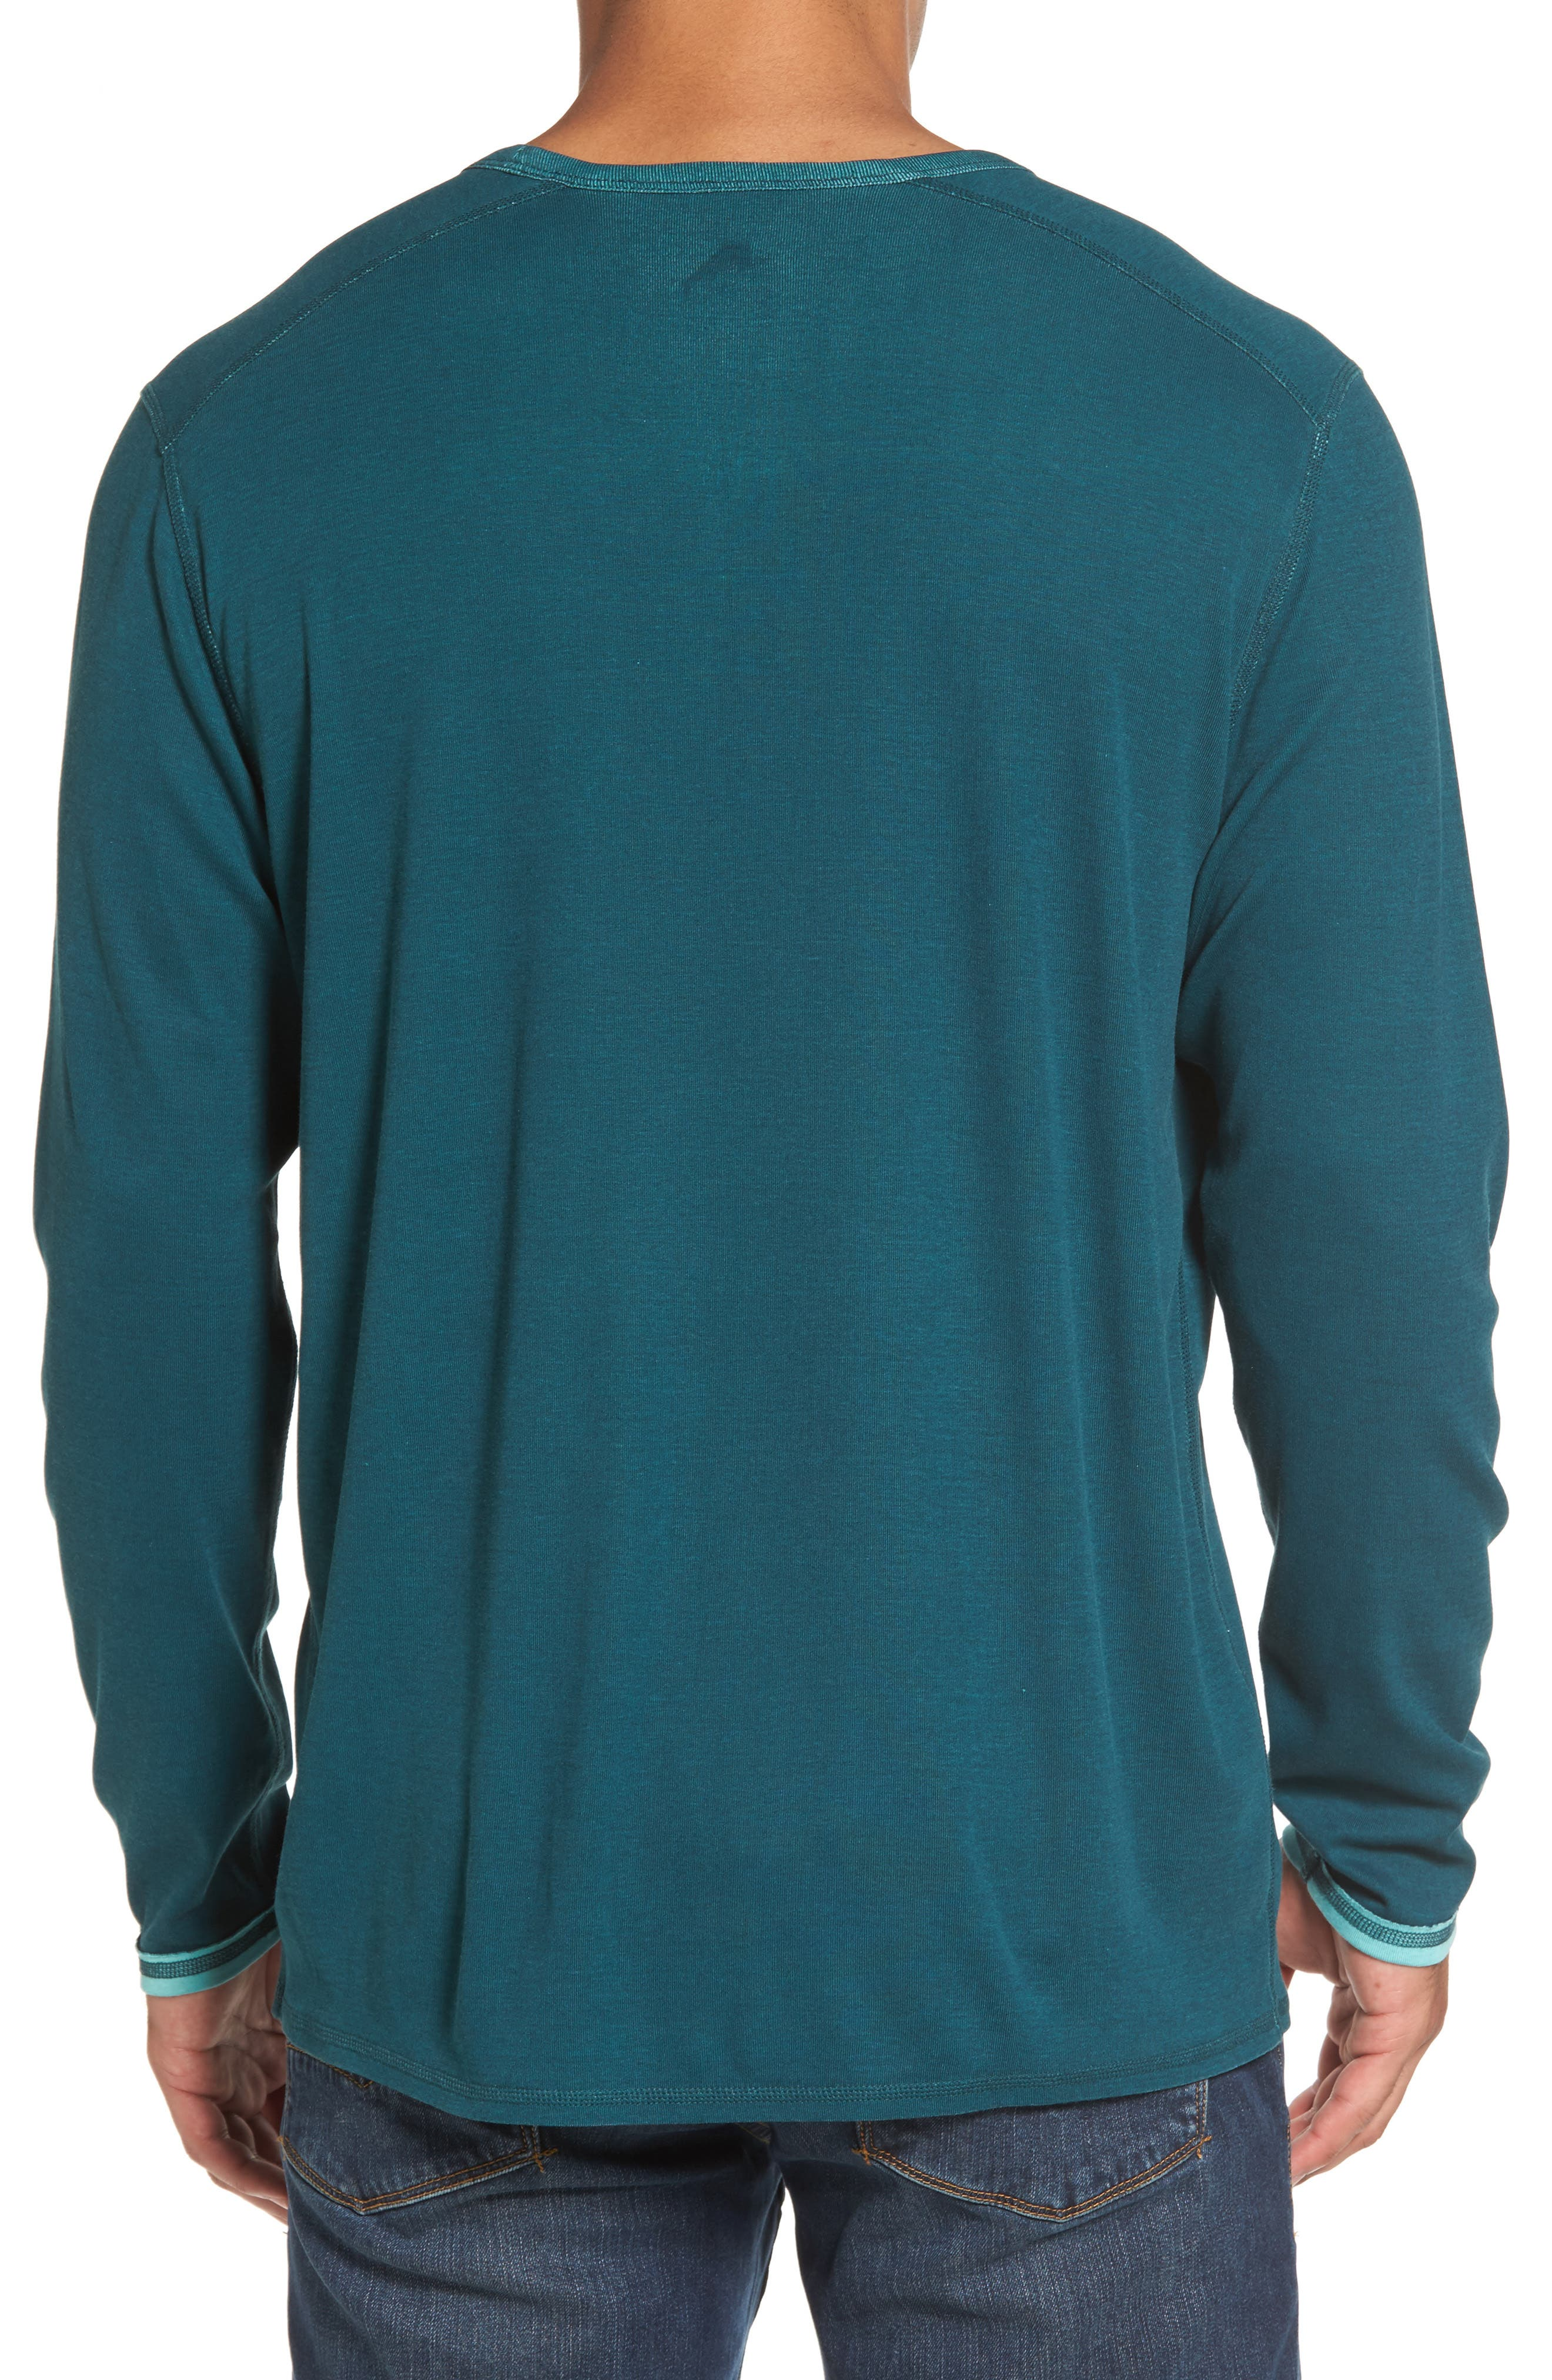 Dual in the Sun Reversible T-Shirt,                             Alternate thumbnail 2, color,                             300